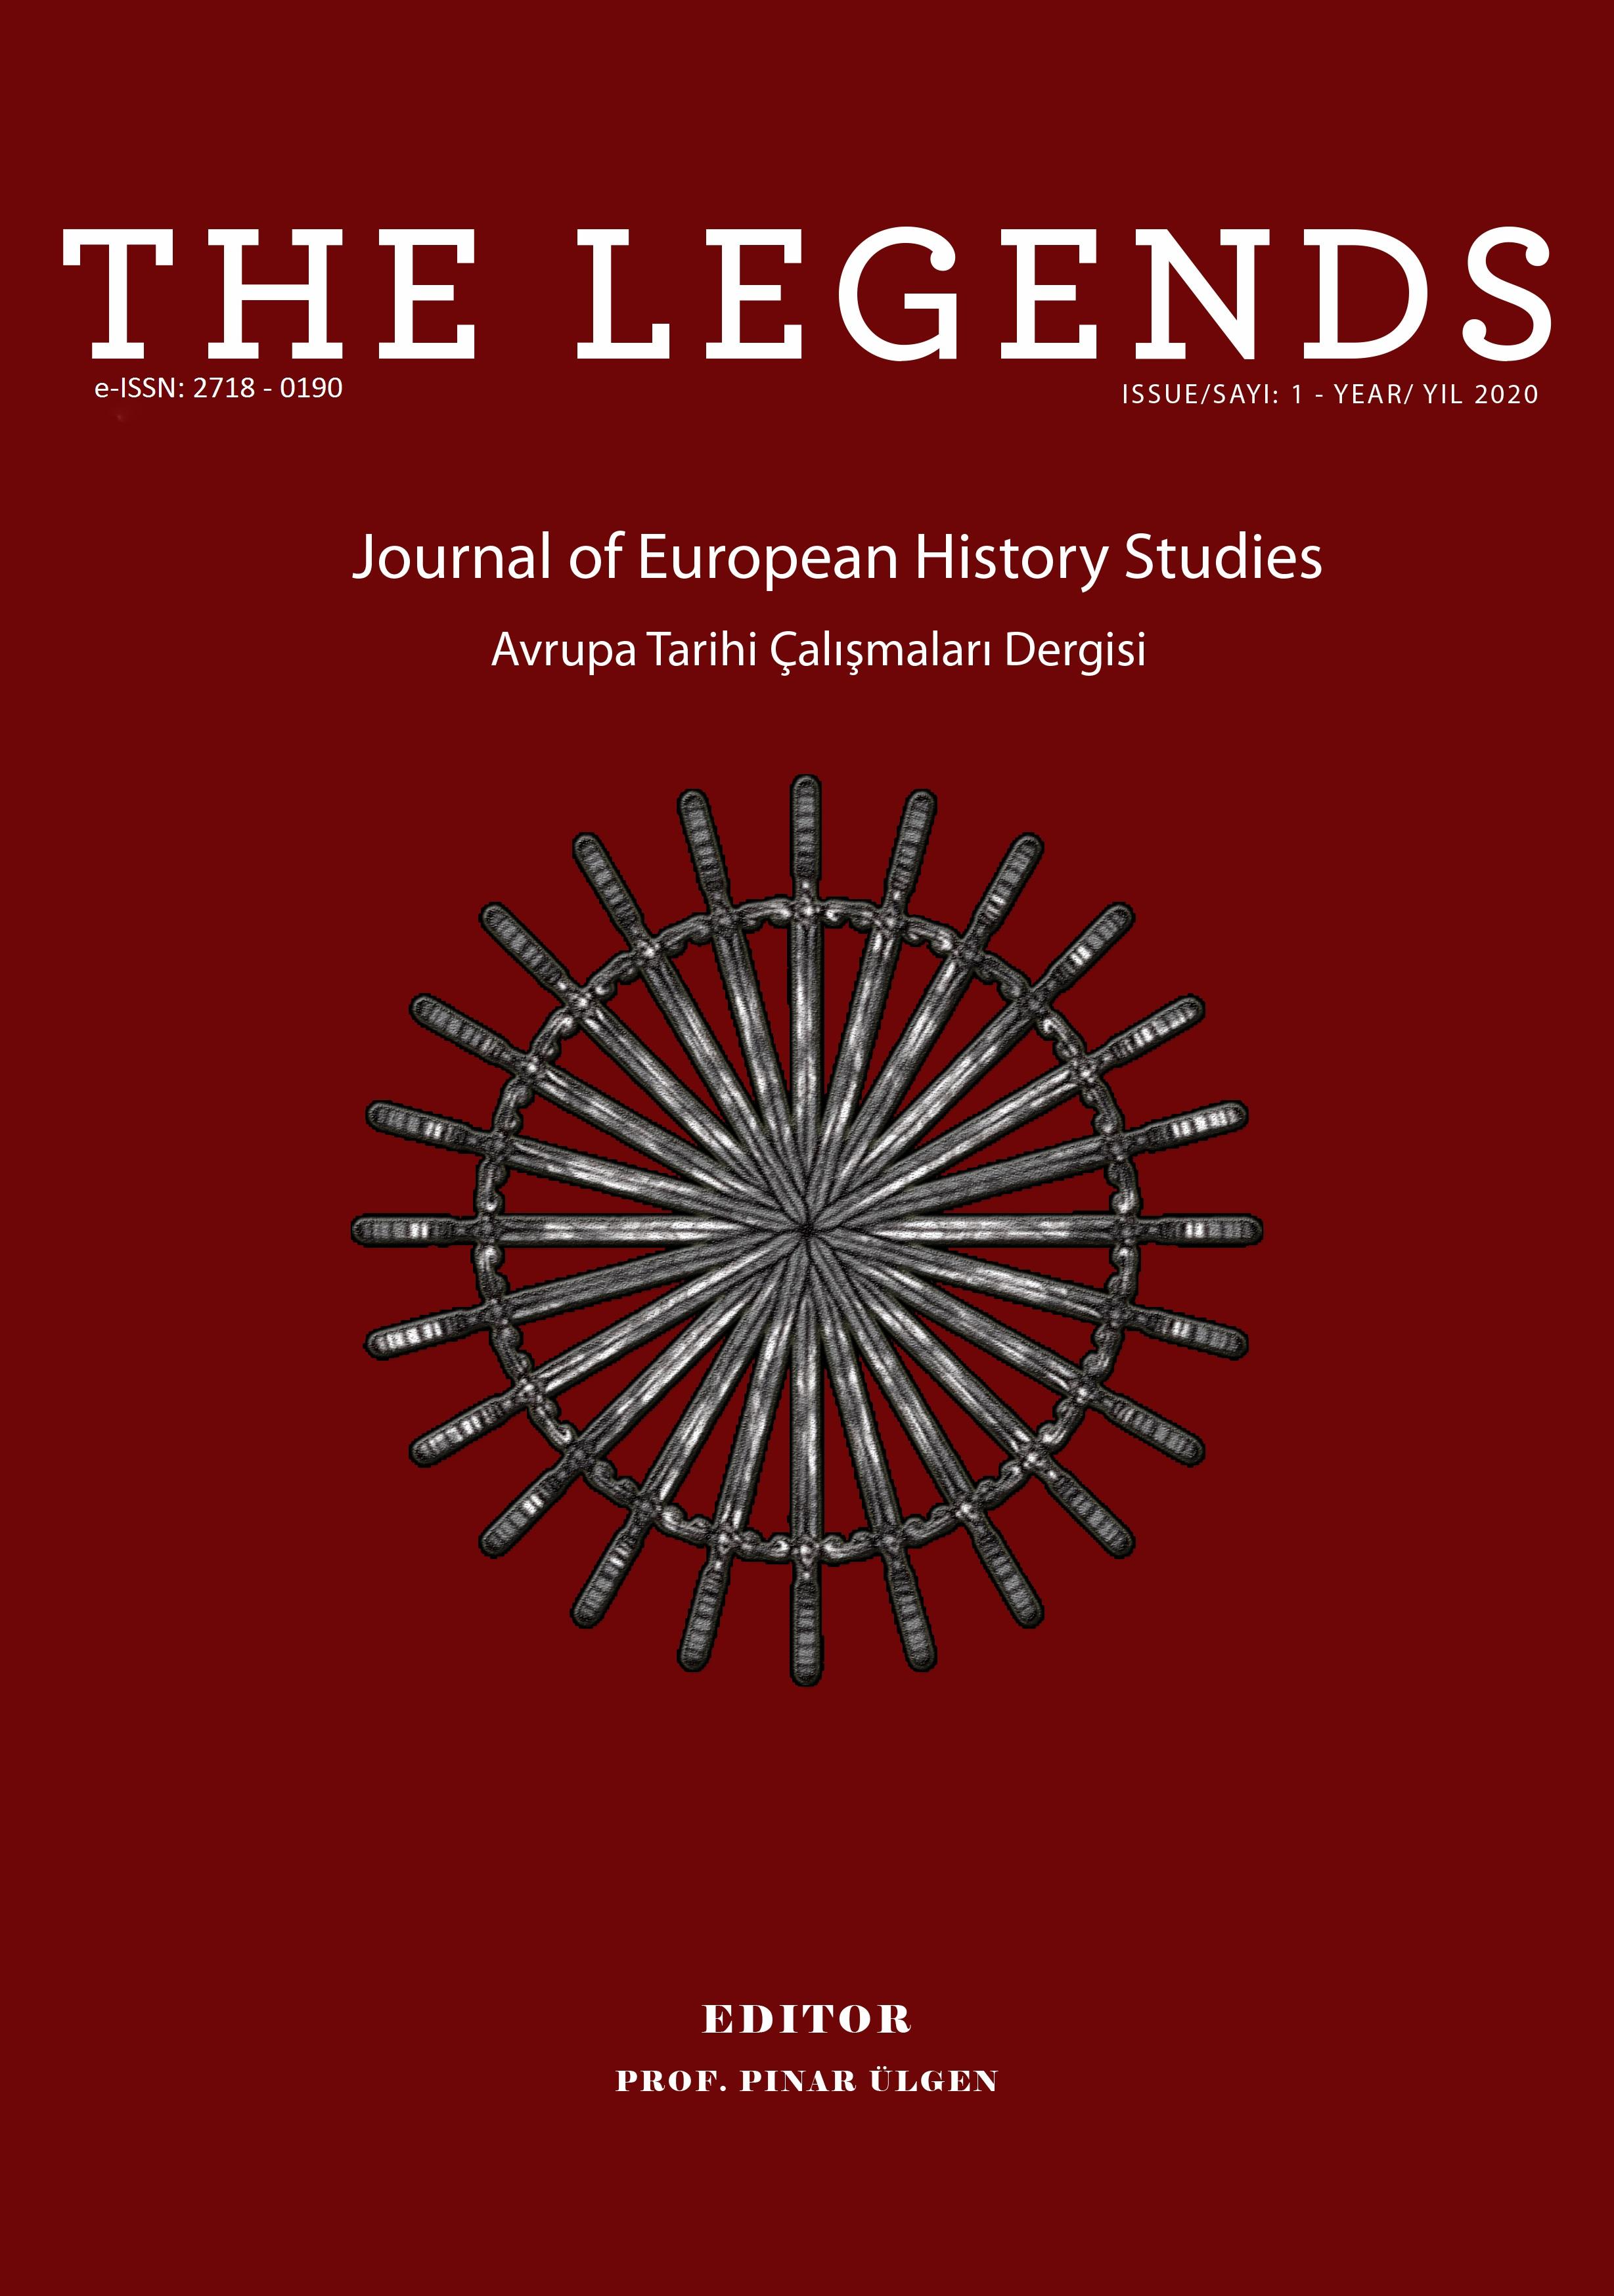 The Legends Journal of European History Studies